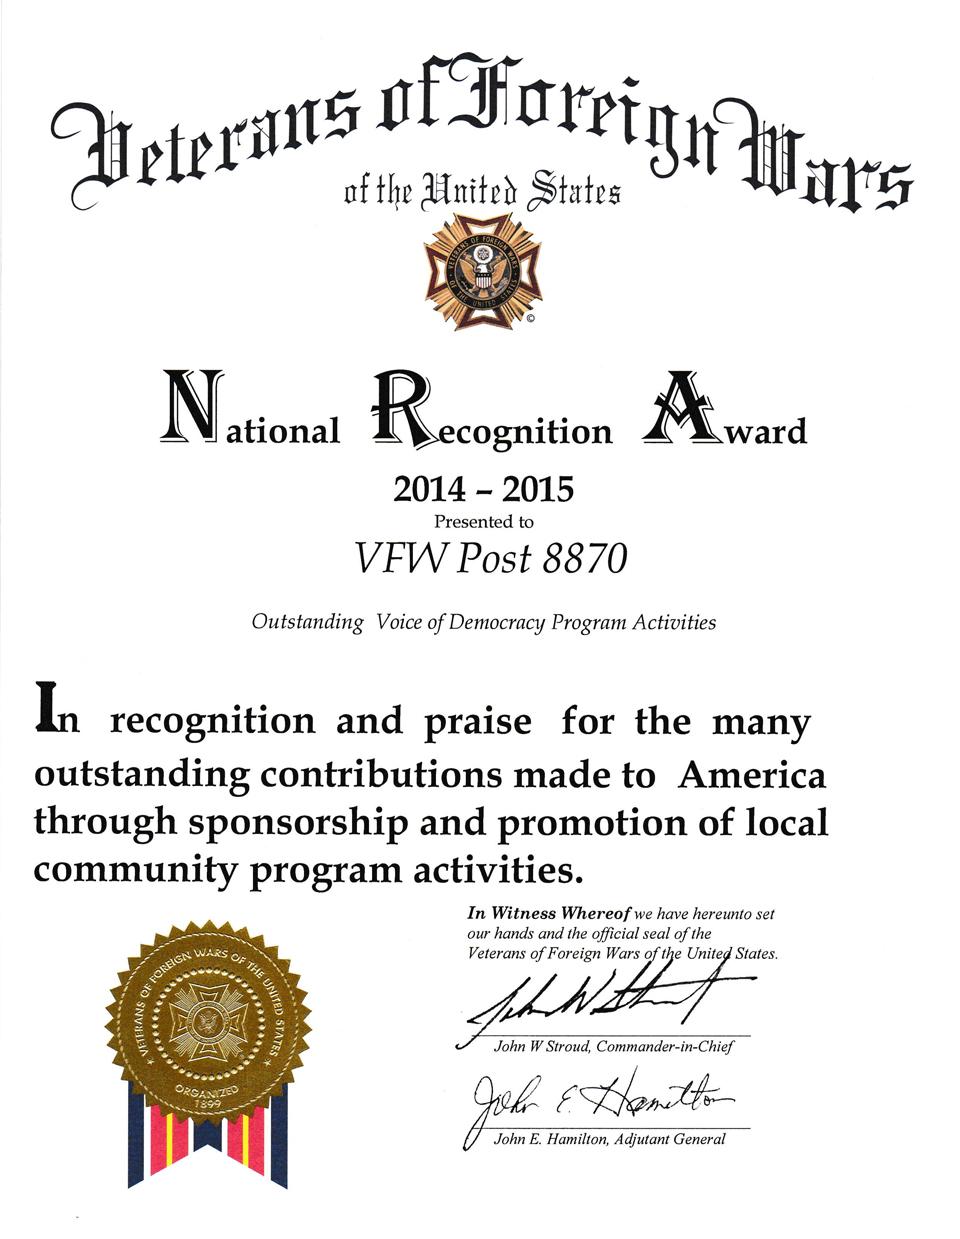 National Recognition Award 2014-2015 Outstanding Voice of Democracy Program Actibities